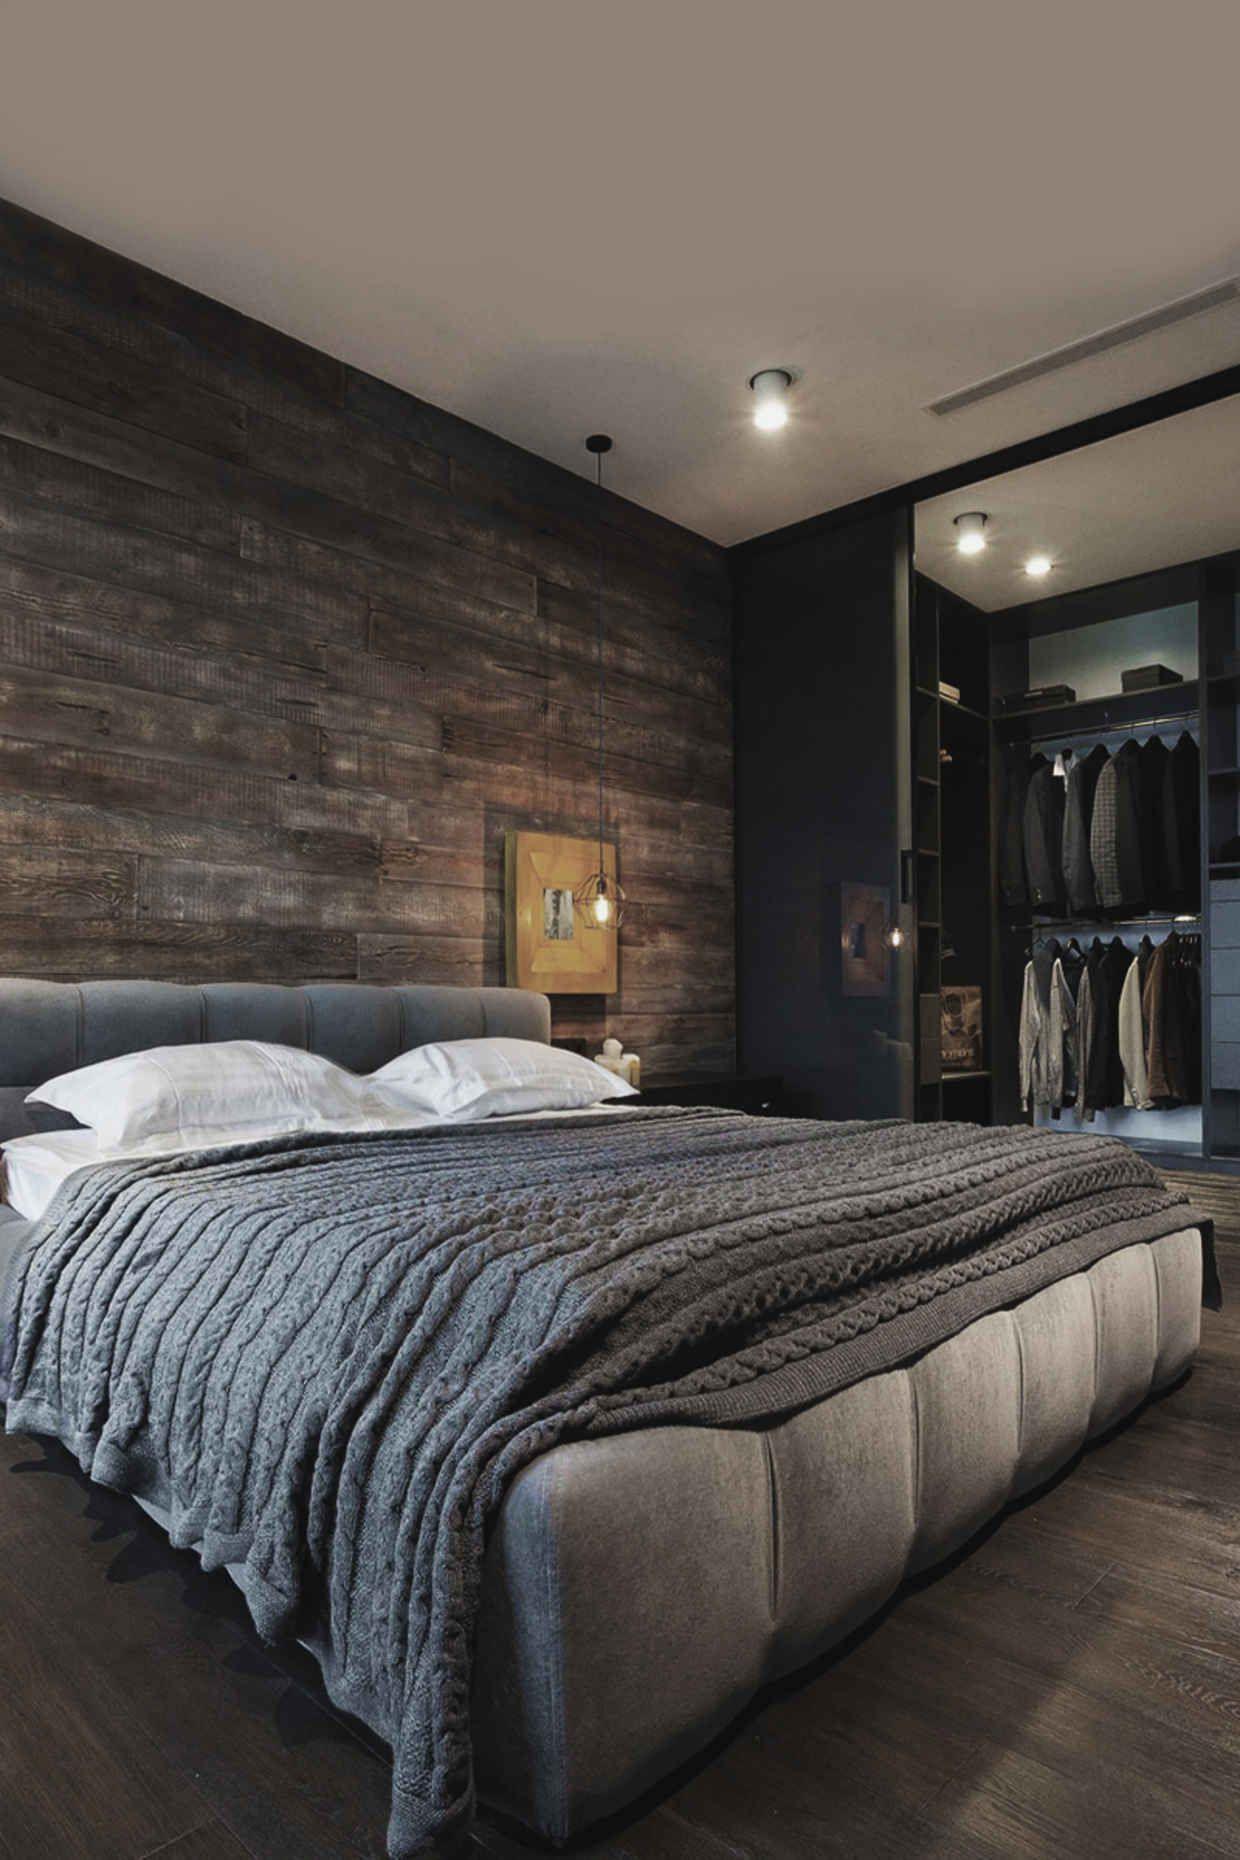 mannelijke slaapkamer man man 6 | For the Home | Pinterest ...